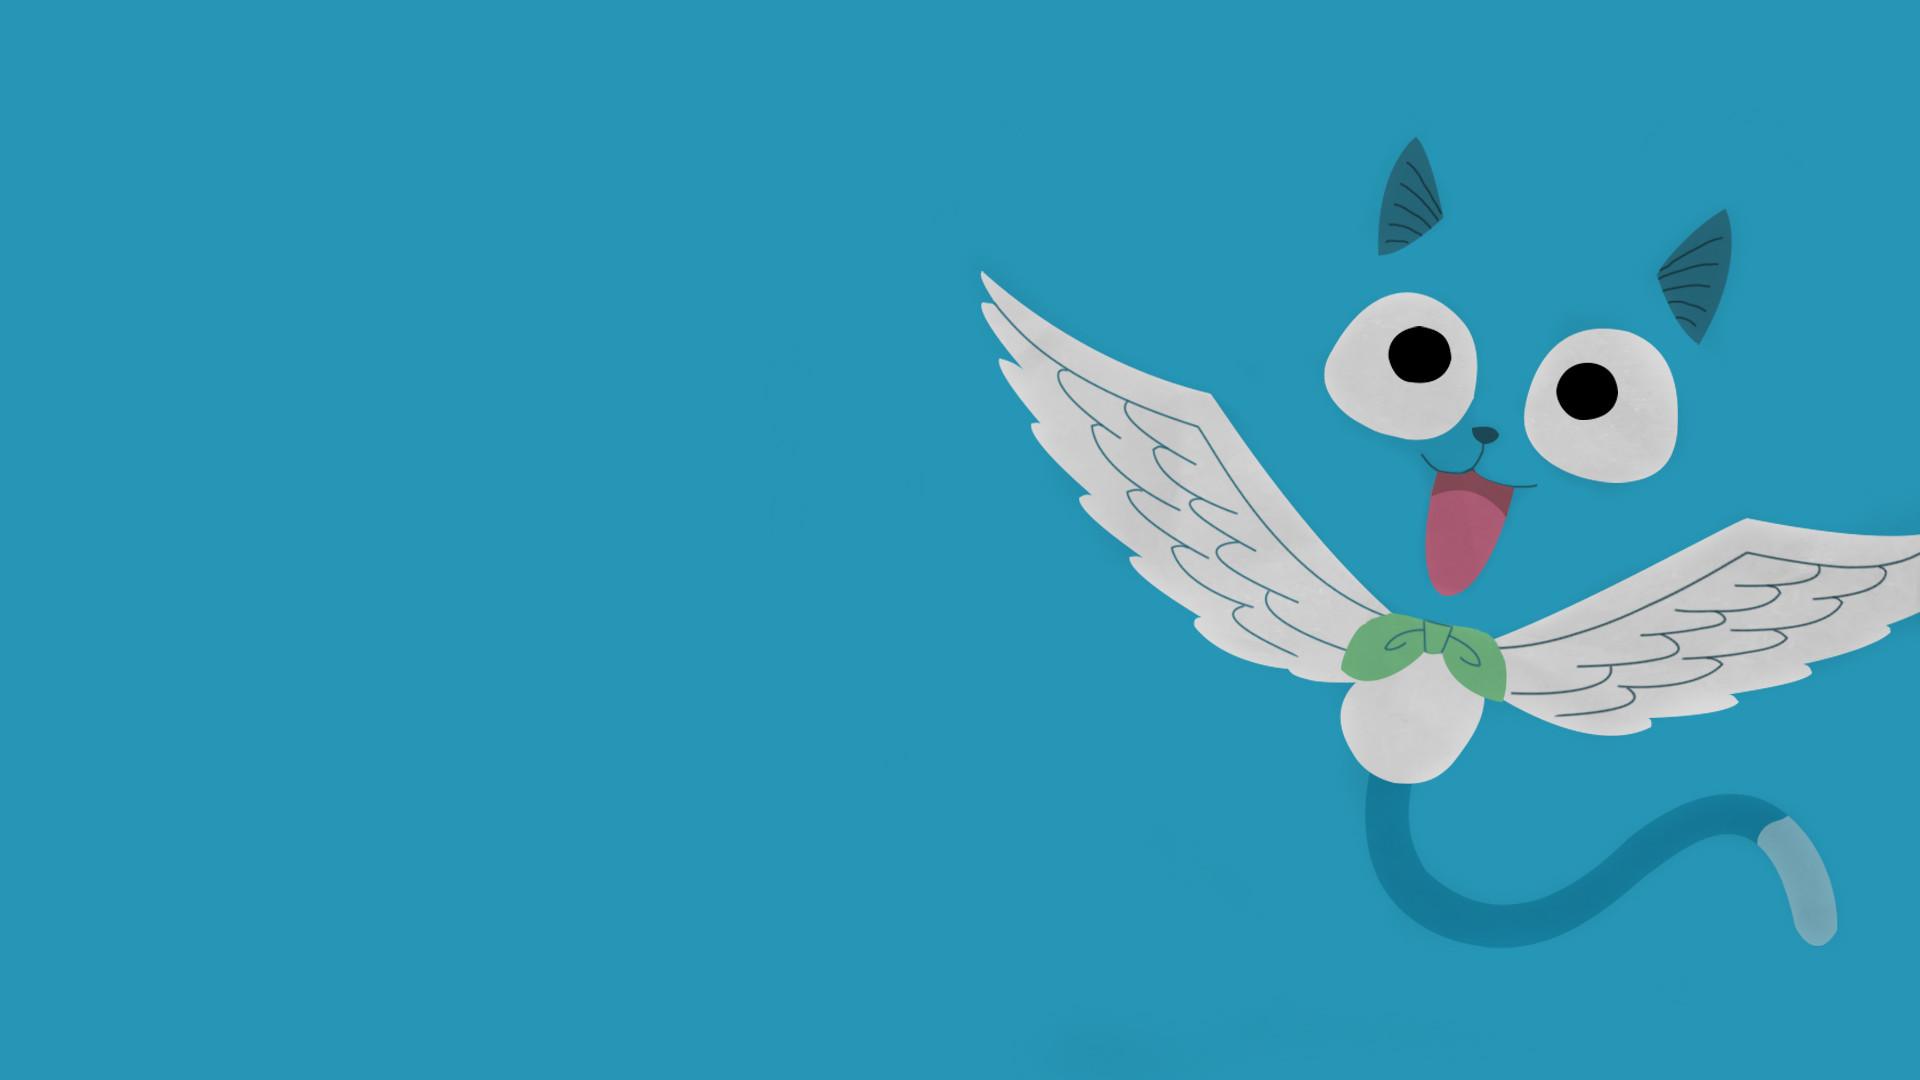 Fairy Tail Happy Wallpapers Desktop Background ~ Sdeerwallpaper